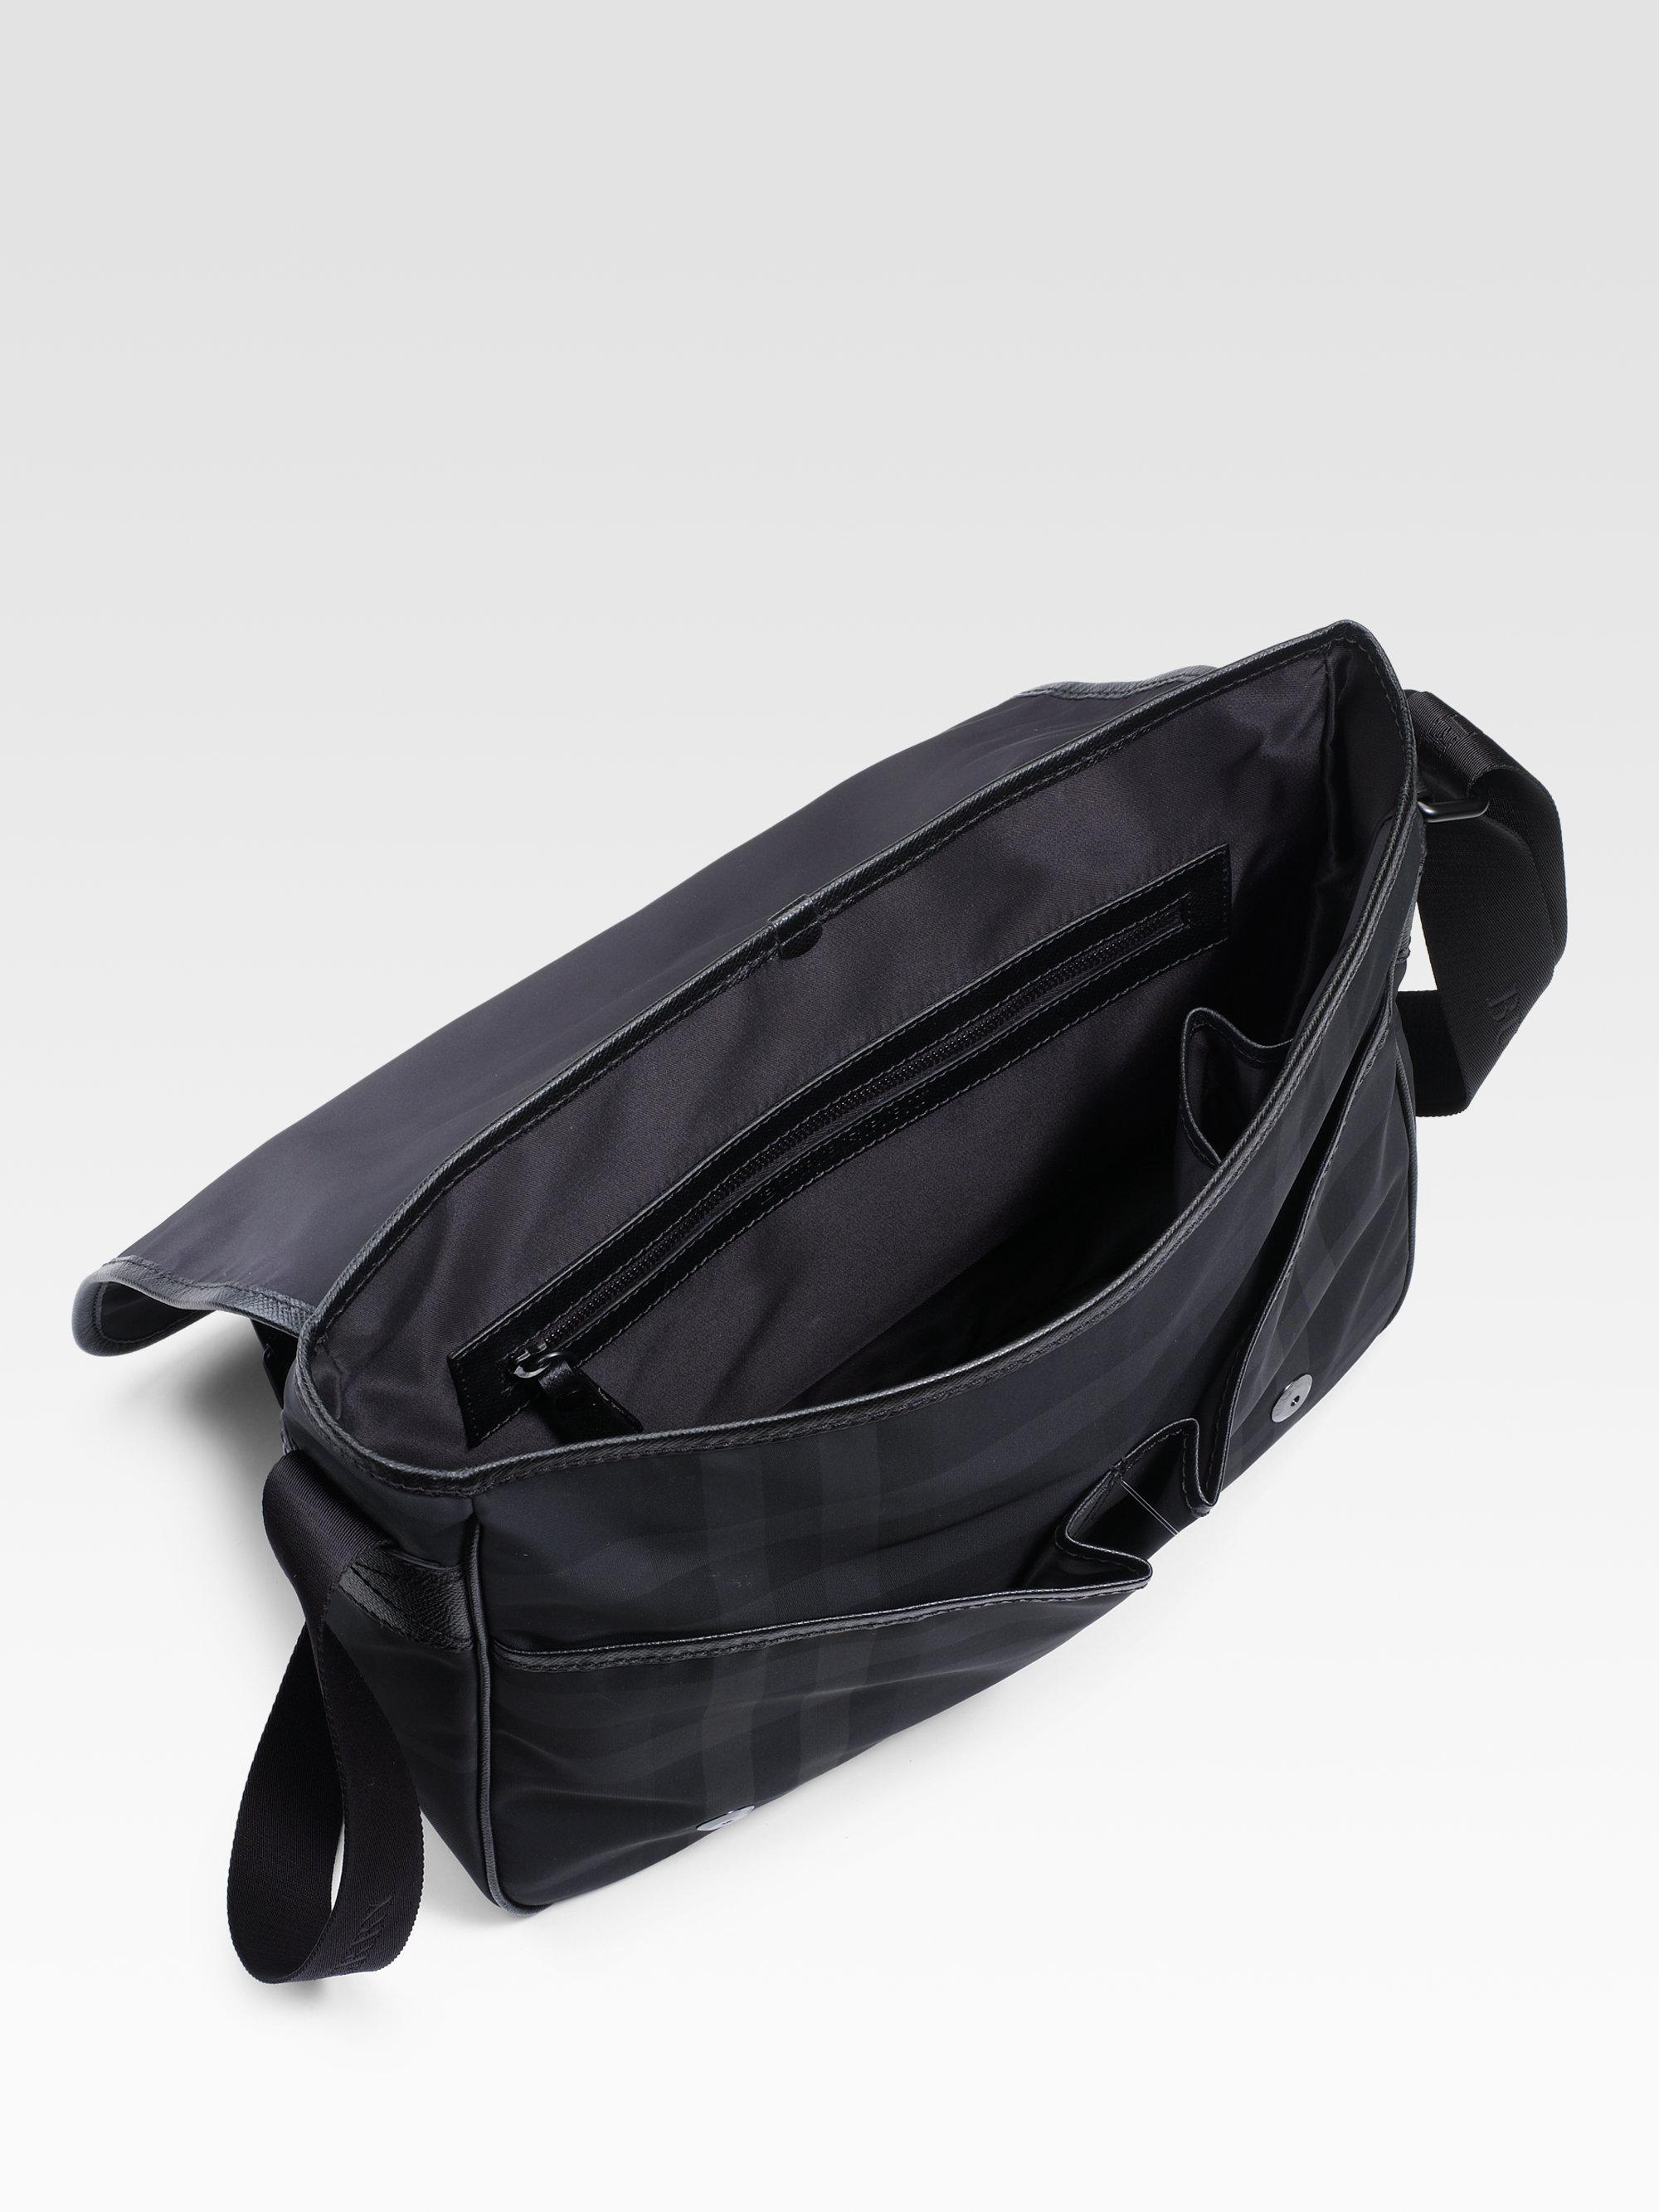 57015a32d8f9 Lyst - Burberry Beat Check Nylon Messenger Bag in Black for Men